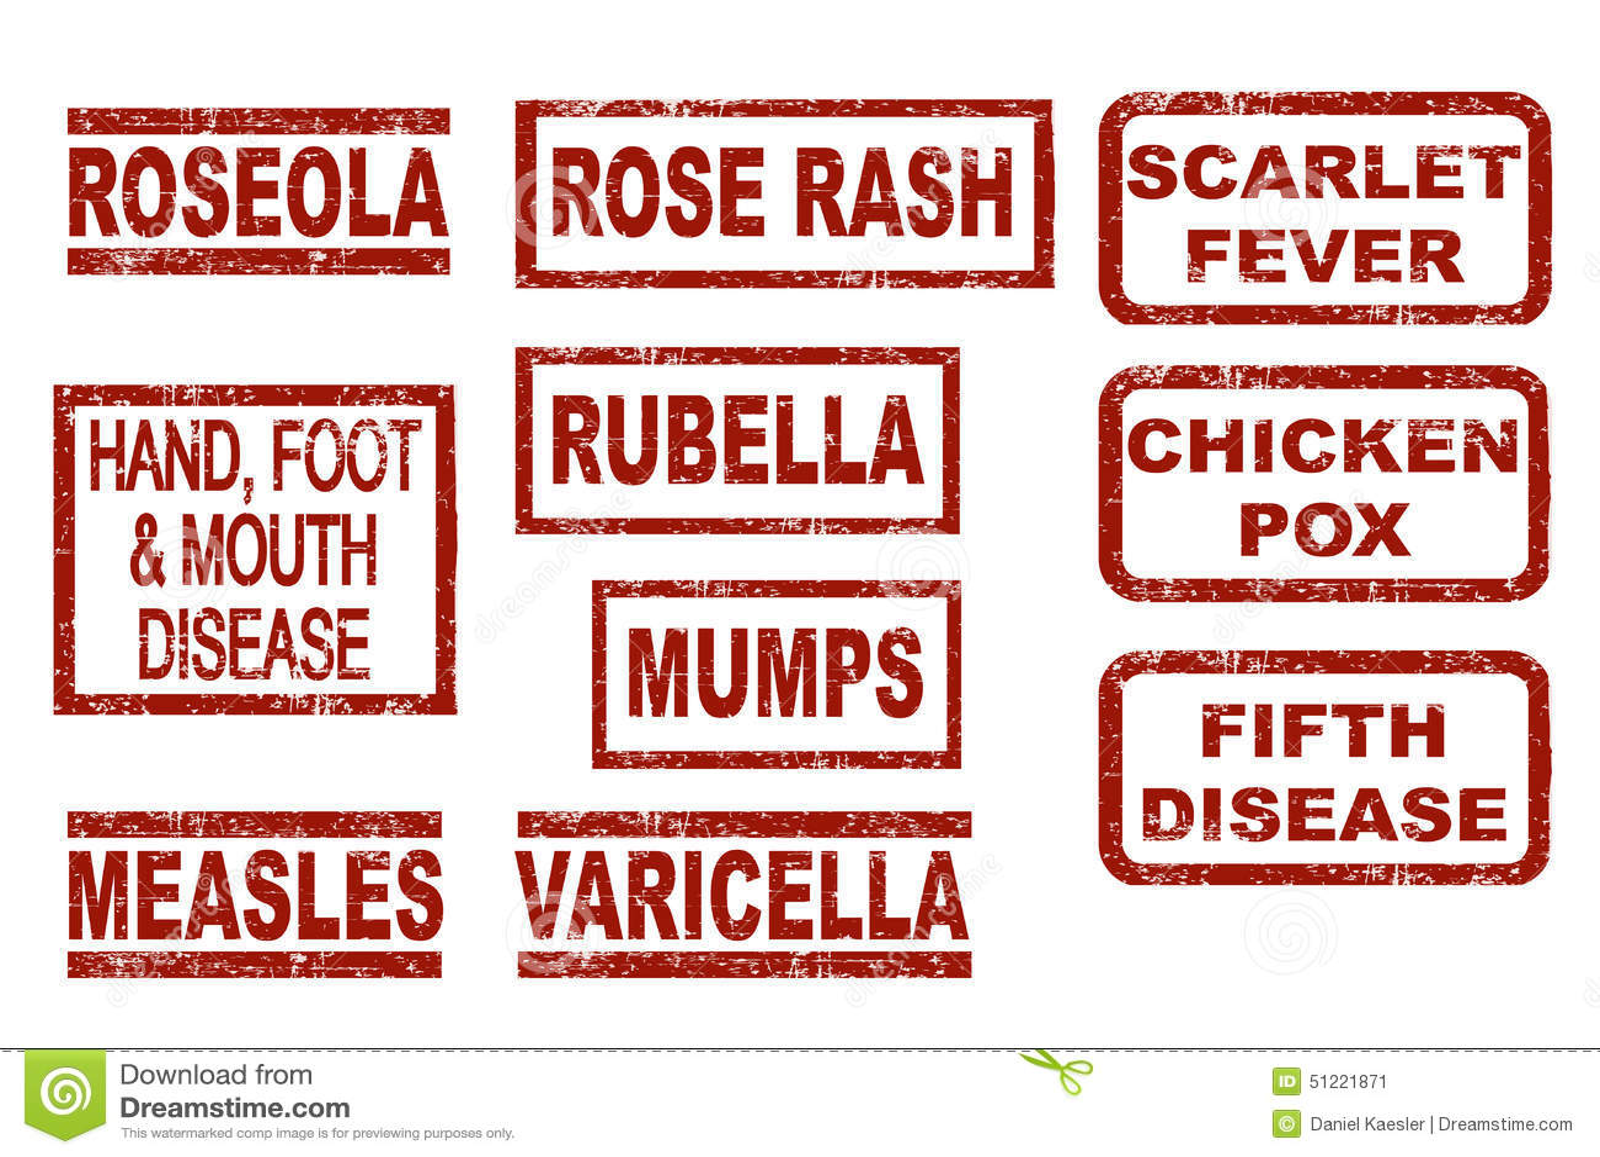 Help Traveling Flu Bug on the Journey to #FightFlu!